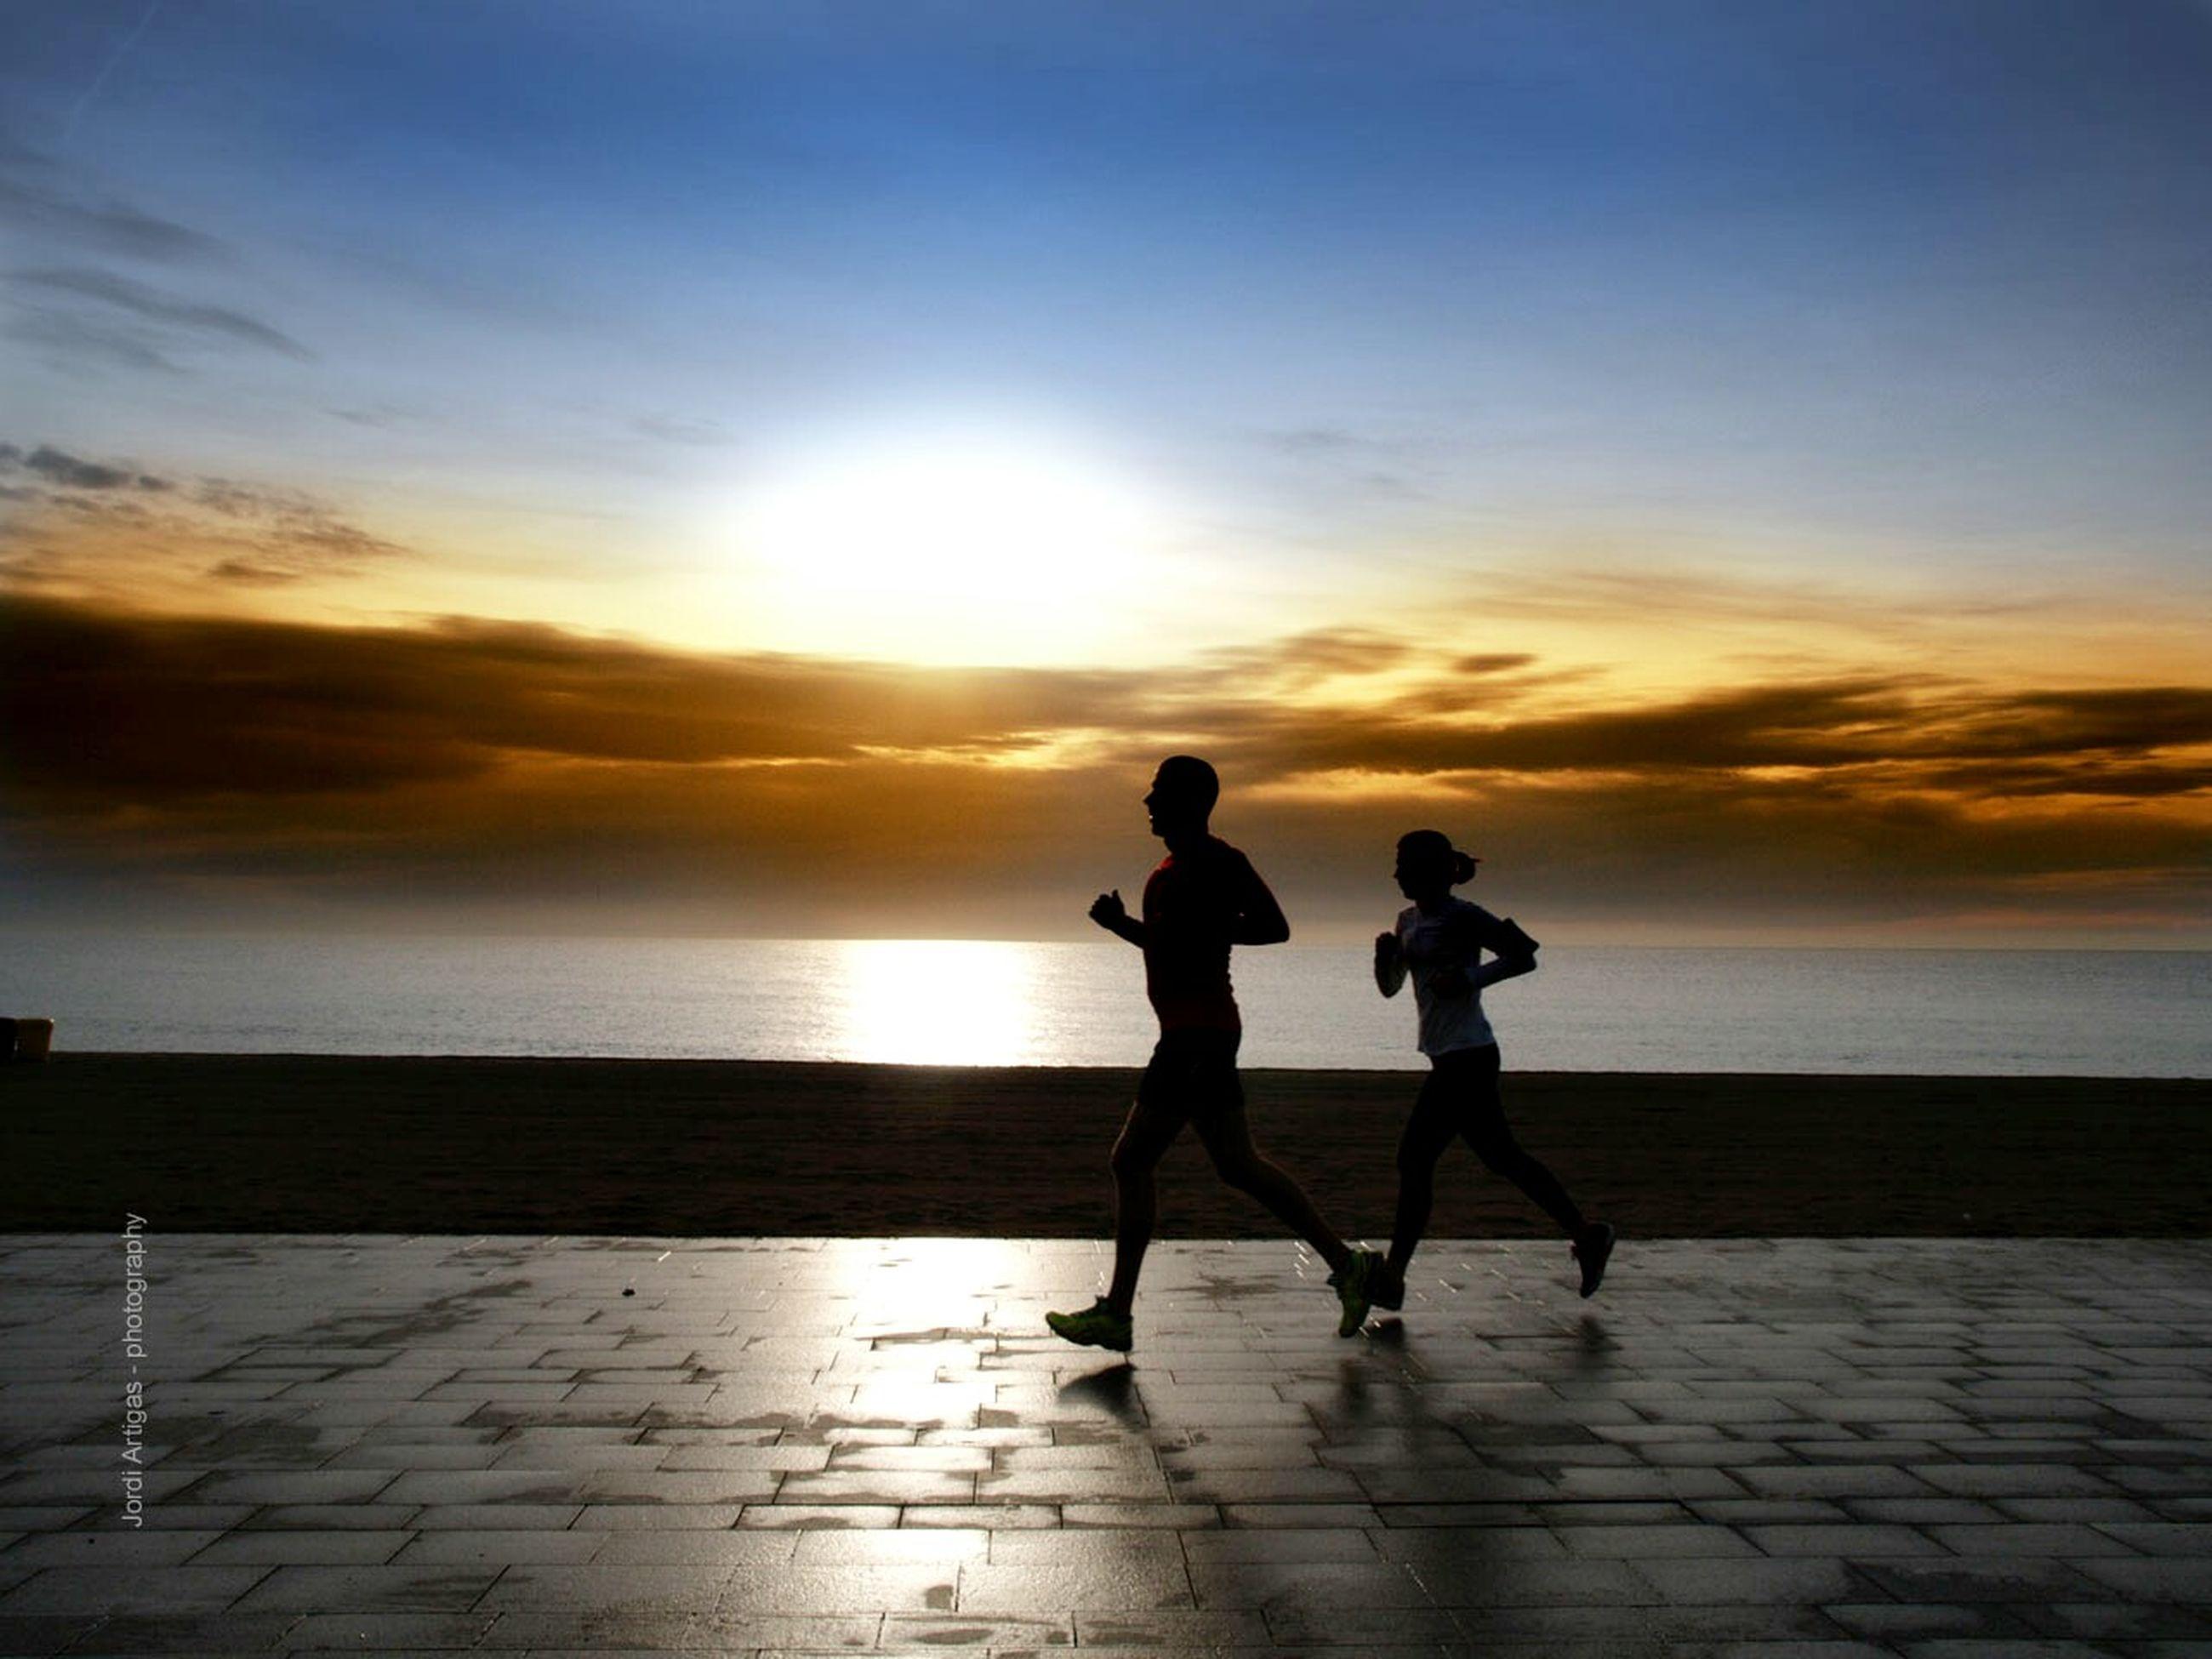 sunset, sea, horizon over water, sky, silhouette, beach, sun, water, full length, lifestyles, orange color, leisure activity, shore, cloud - sky, men, sunlight, scenics, walking, reflection